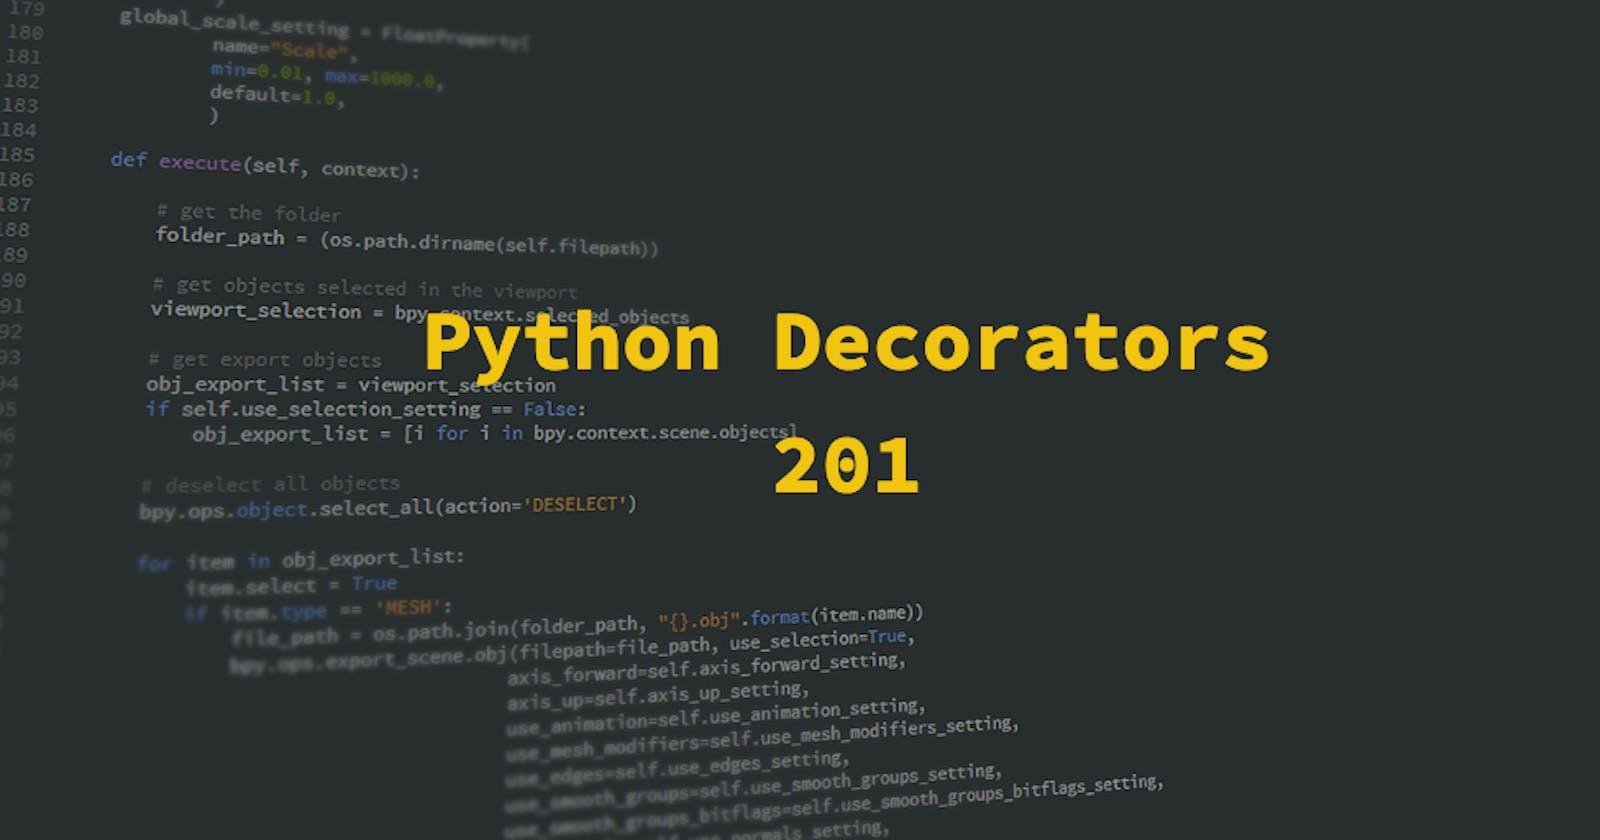 Python Decorators 201